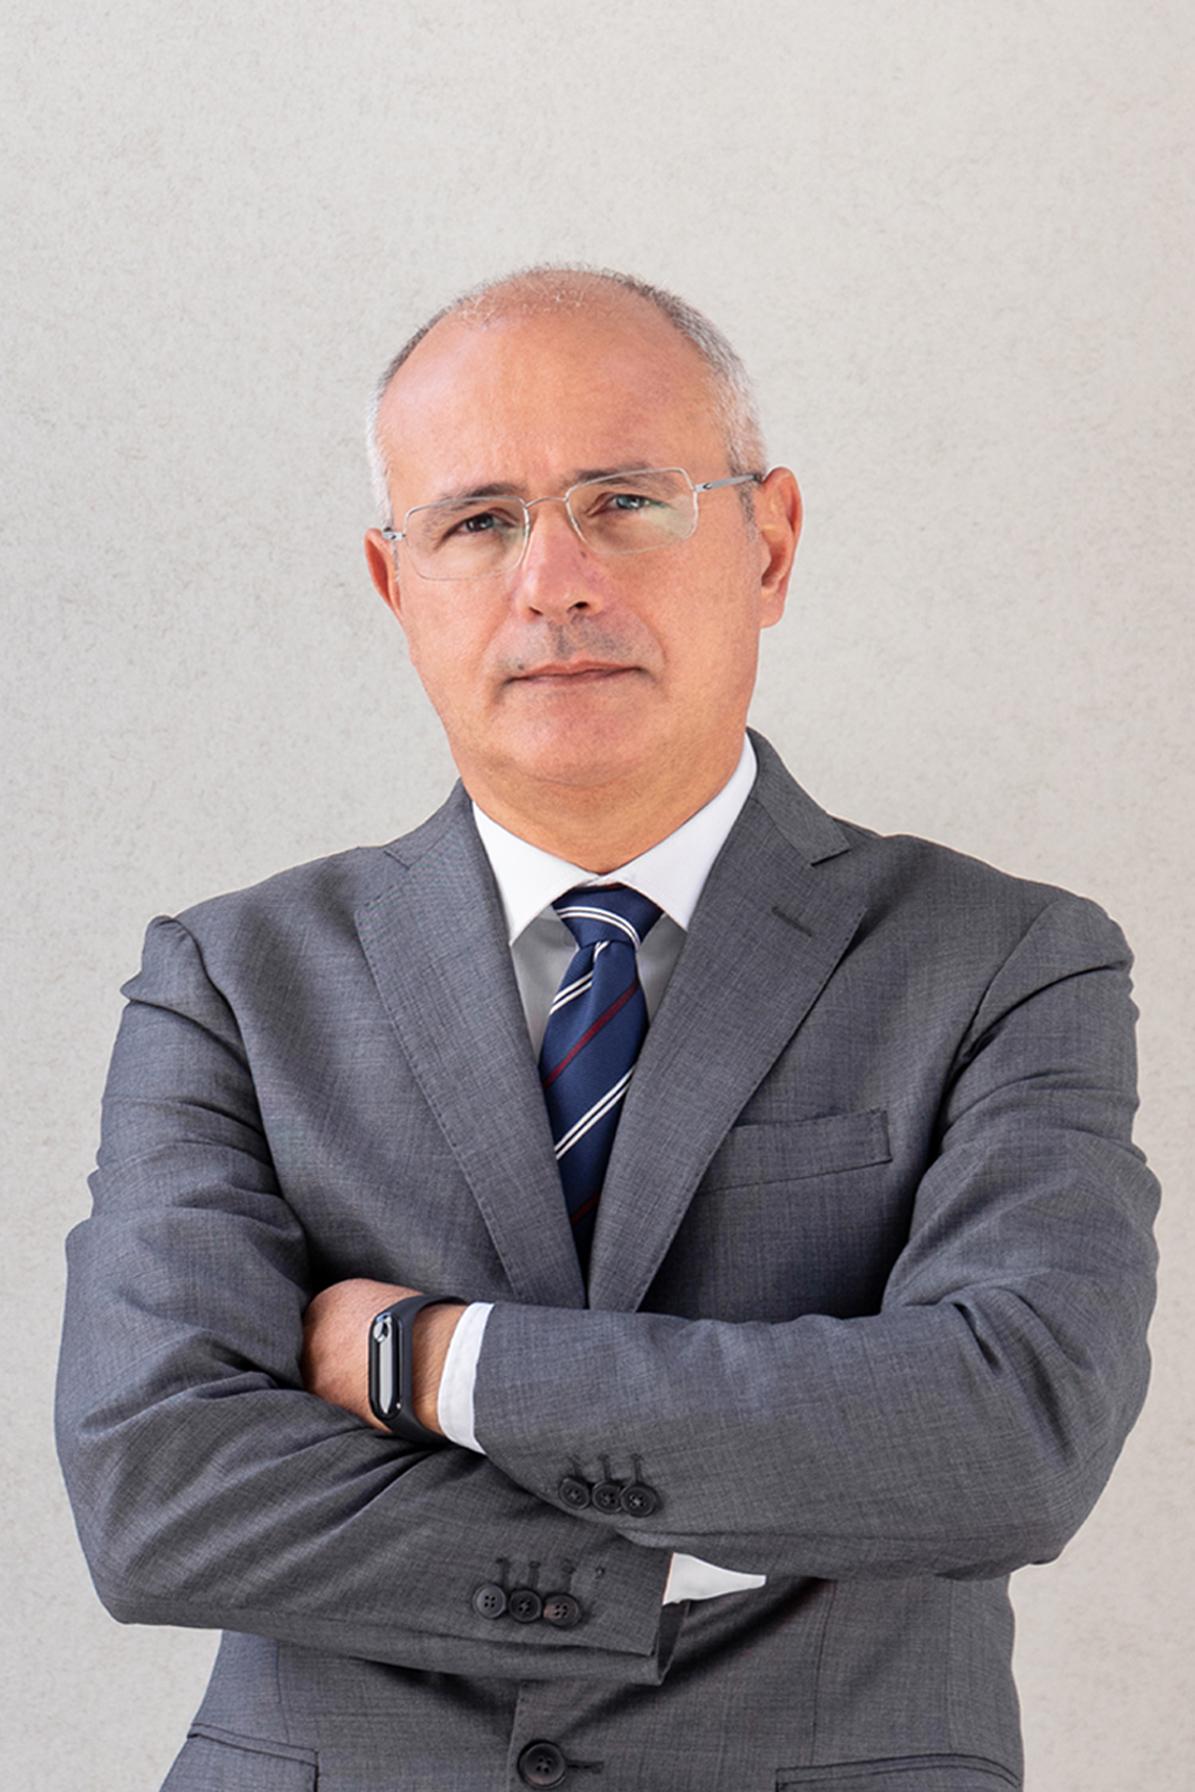 Giorgio Berardi